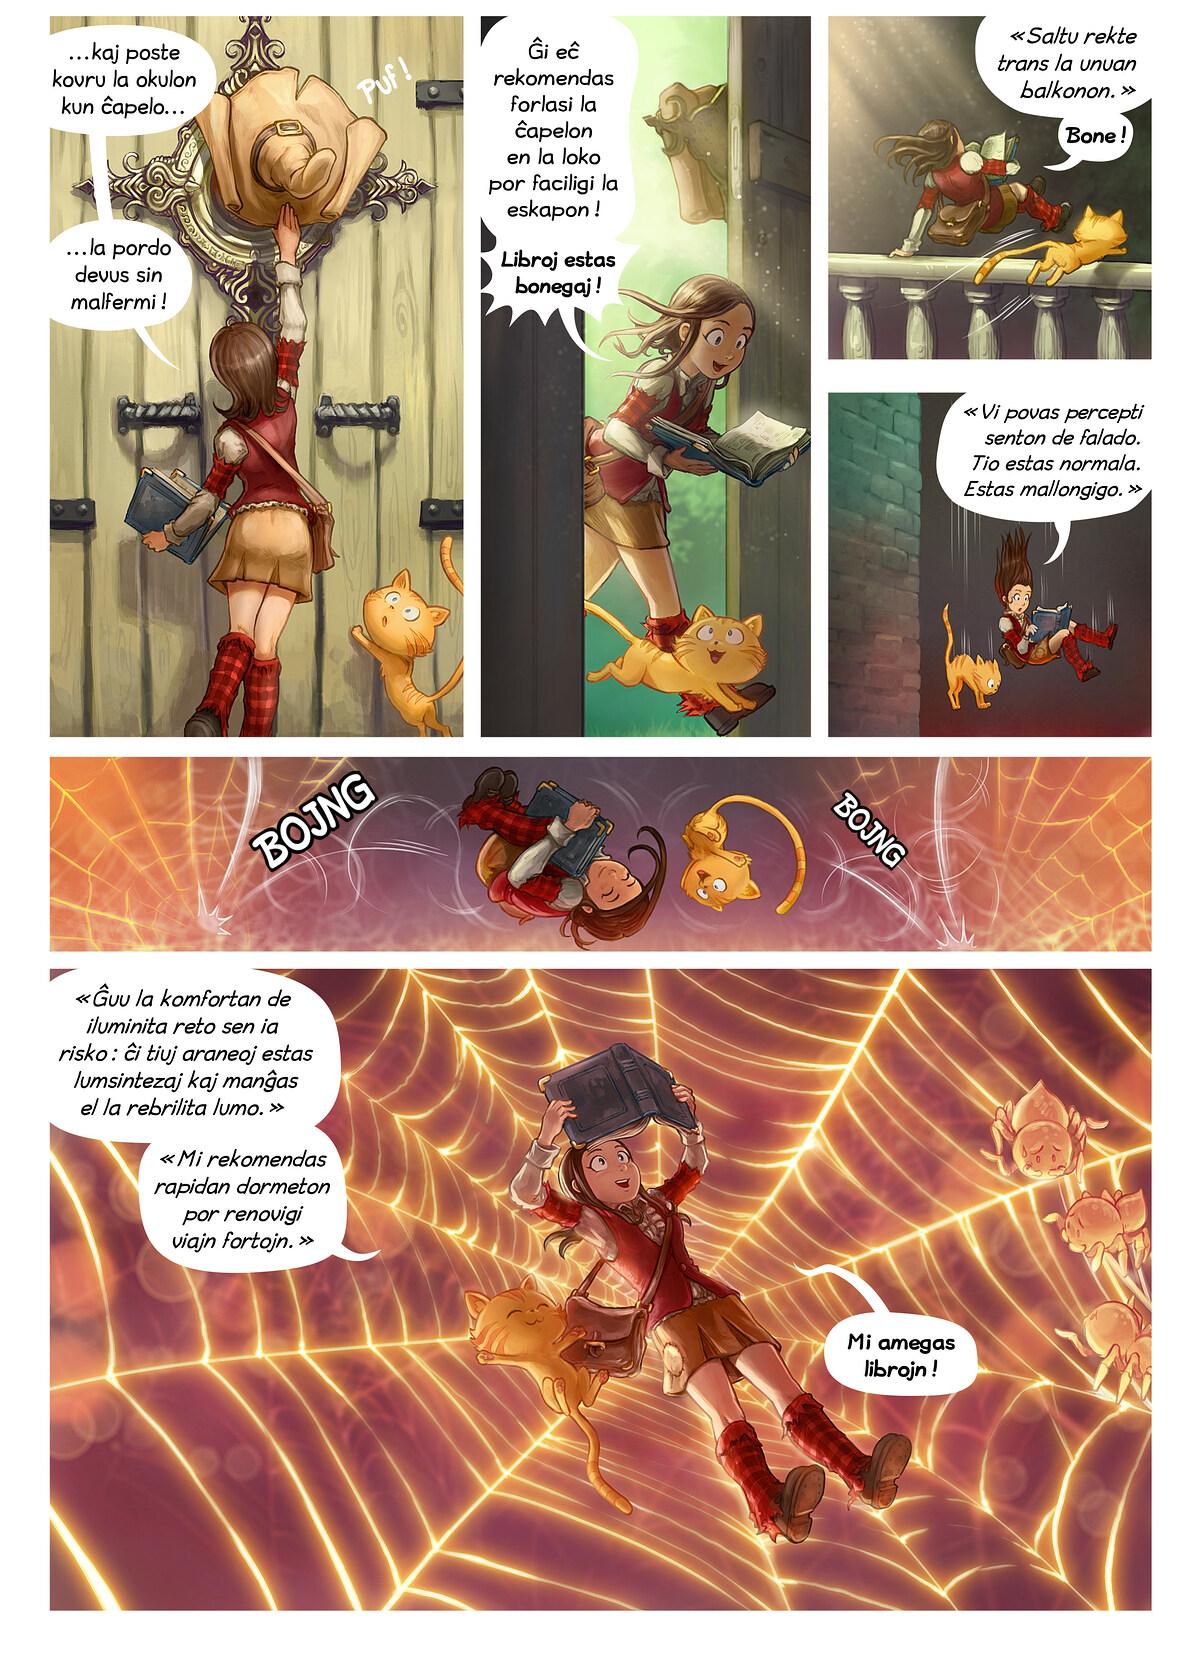 A webcomic page of Pepper&Carrot, rakonto 26 [eo], paĝo 2